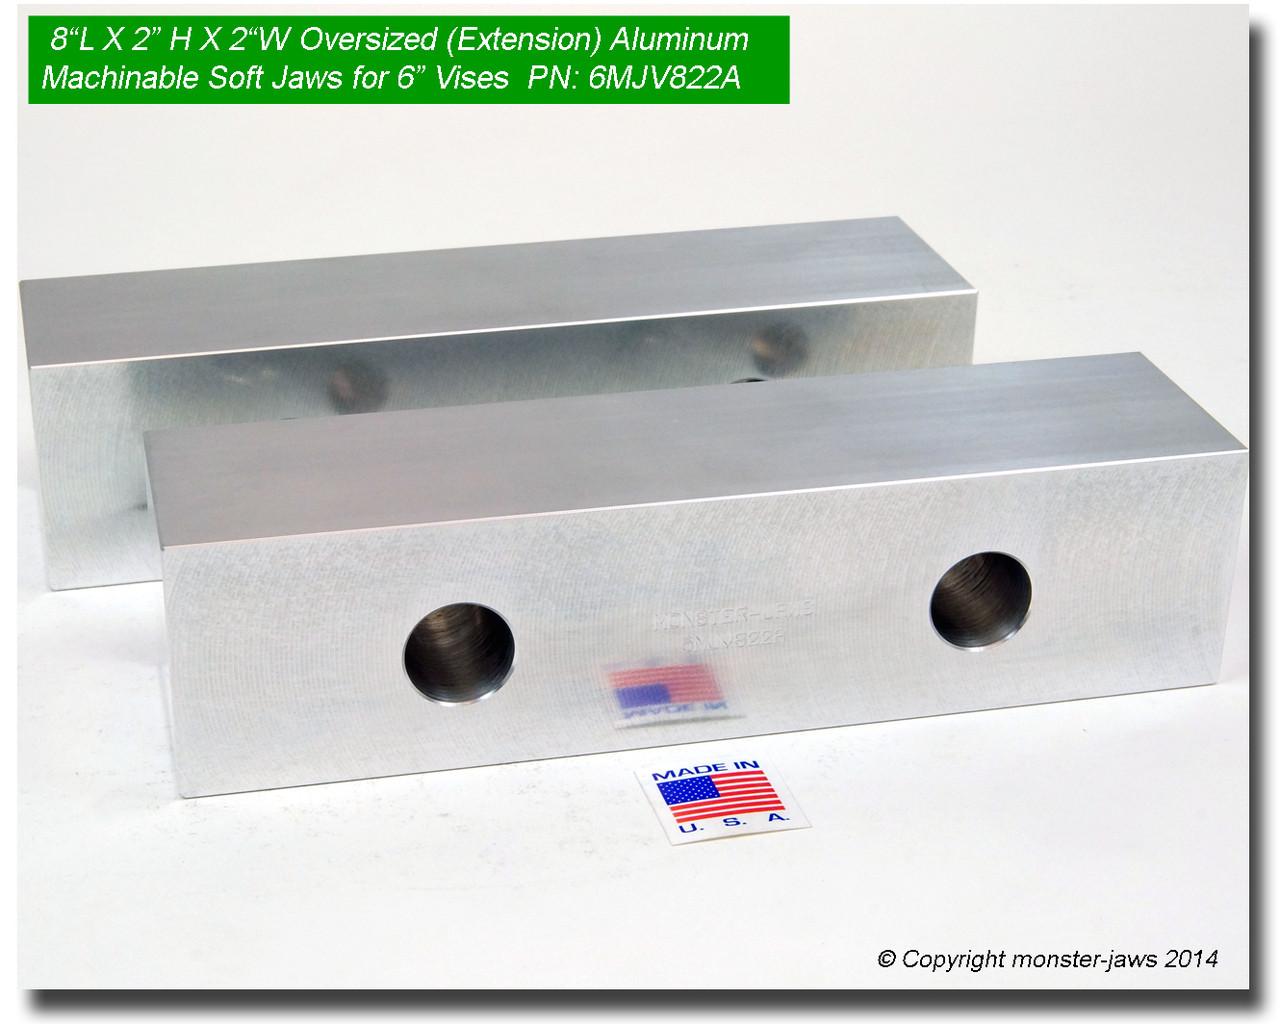 "20 PACK 6 x 2 x1.25 Machined Aluminum Vise Soft Jaws For Kurt 6/"" Vises FREE SHIP"